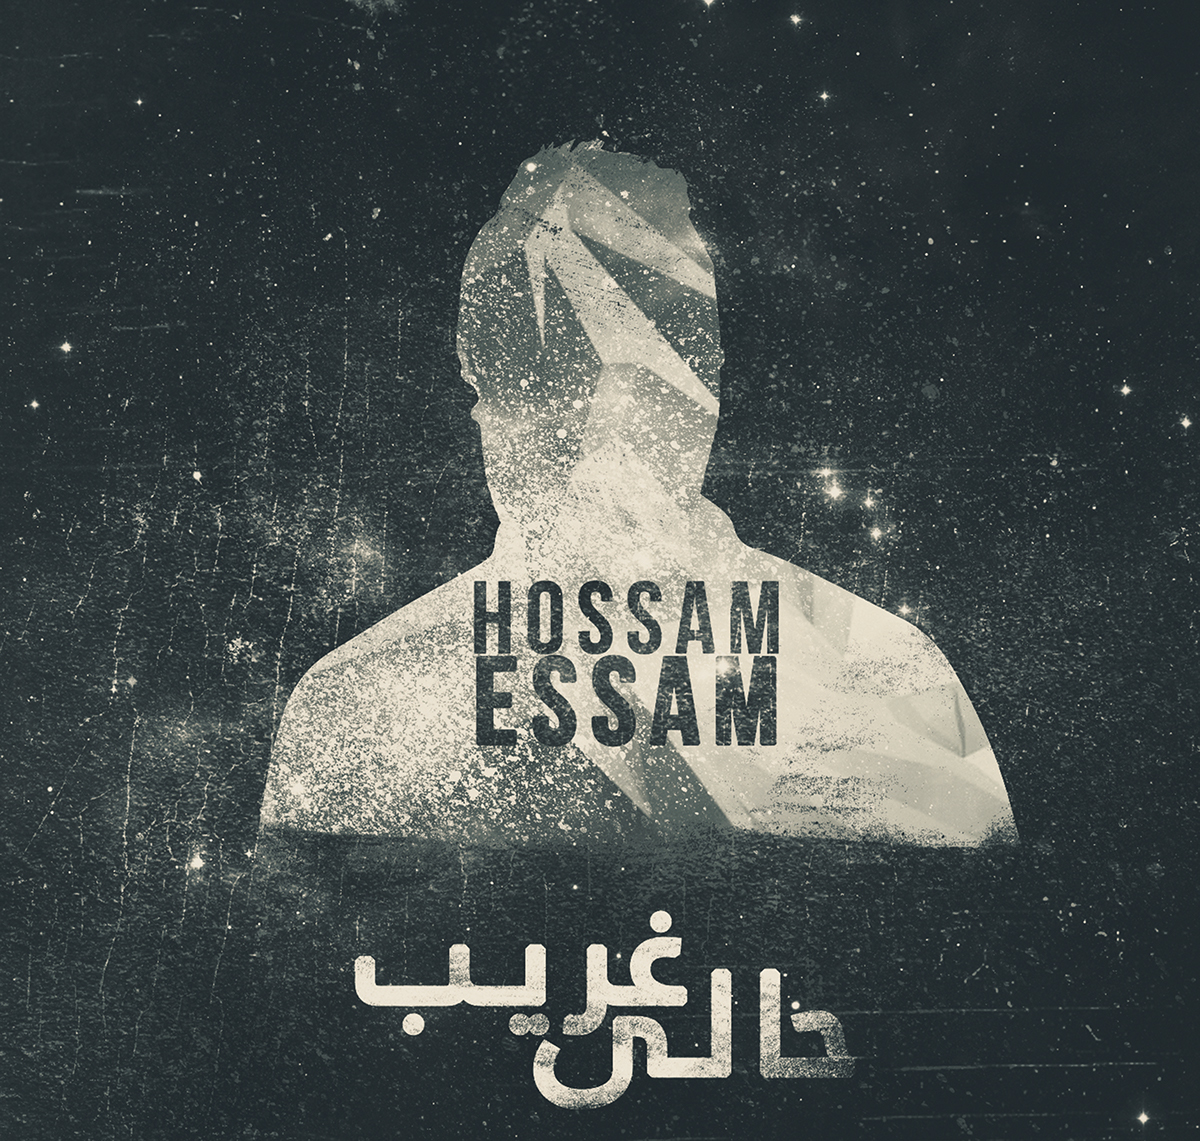 Gharib 7ali Album Cover Art And Poster